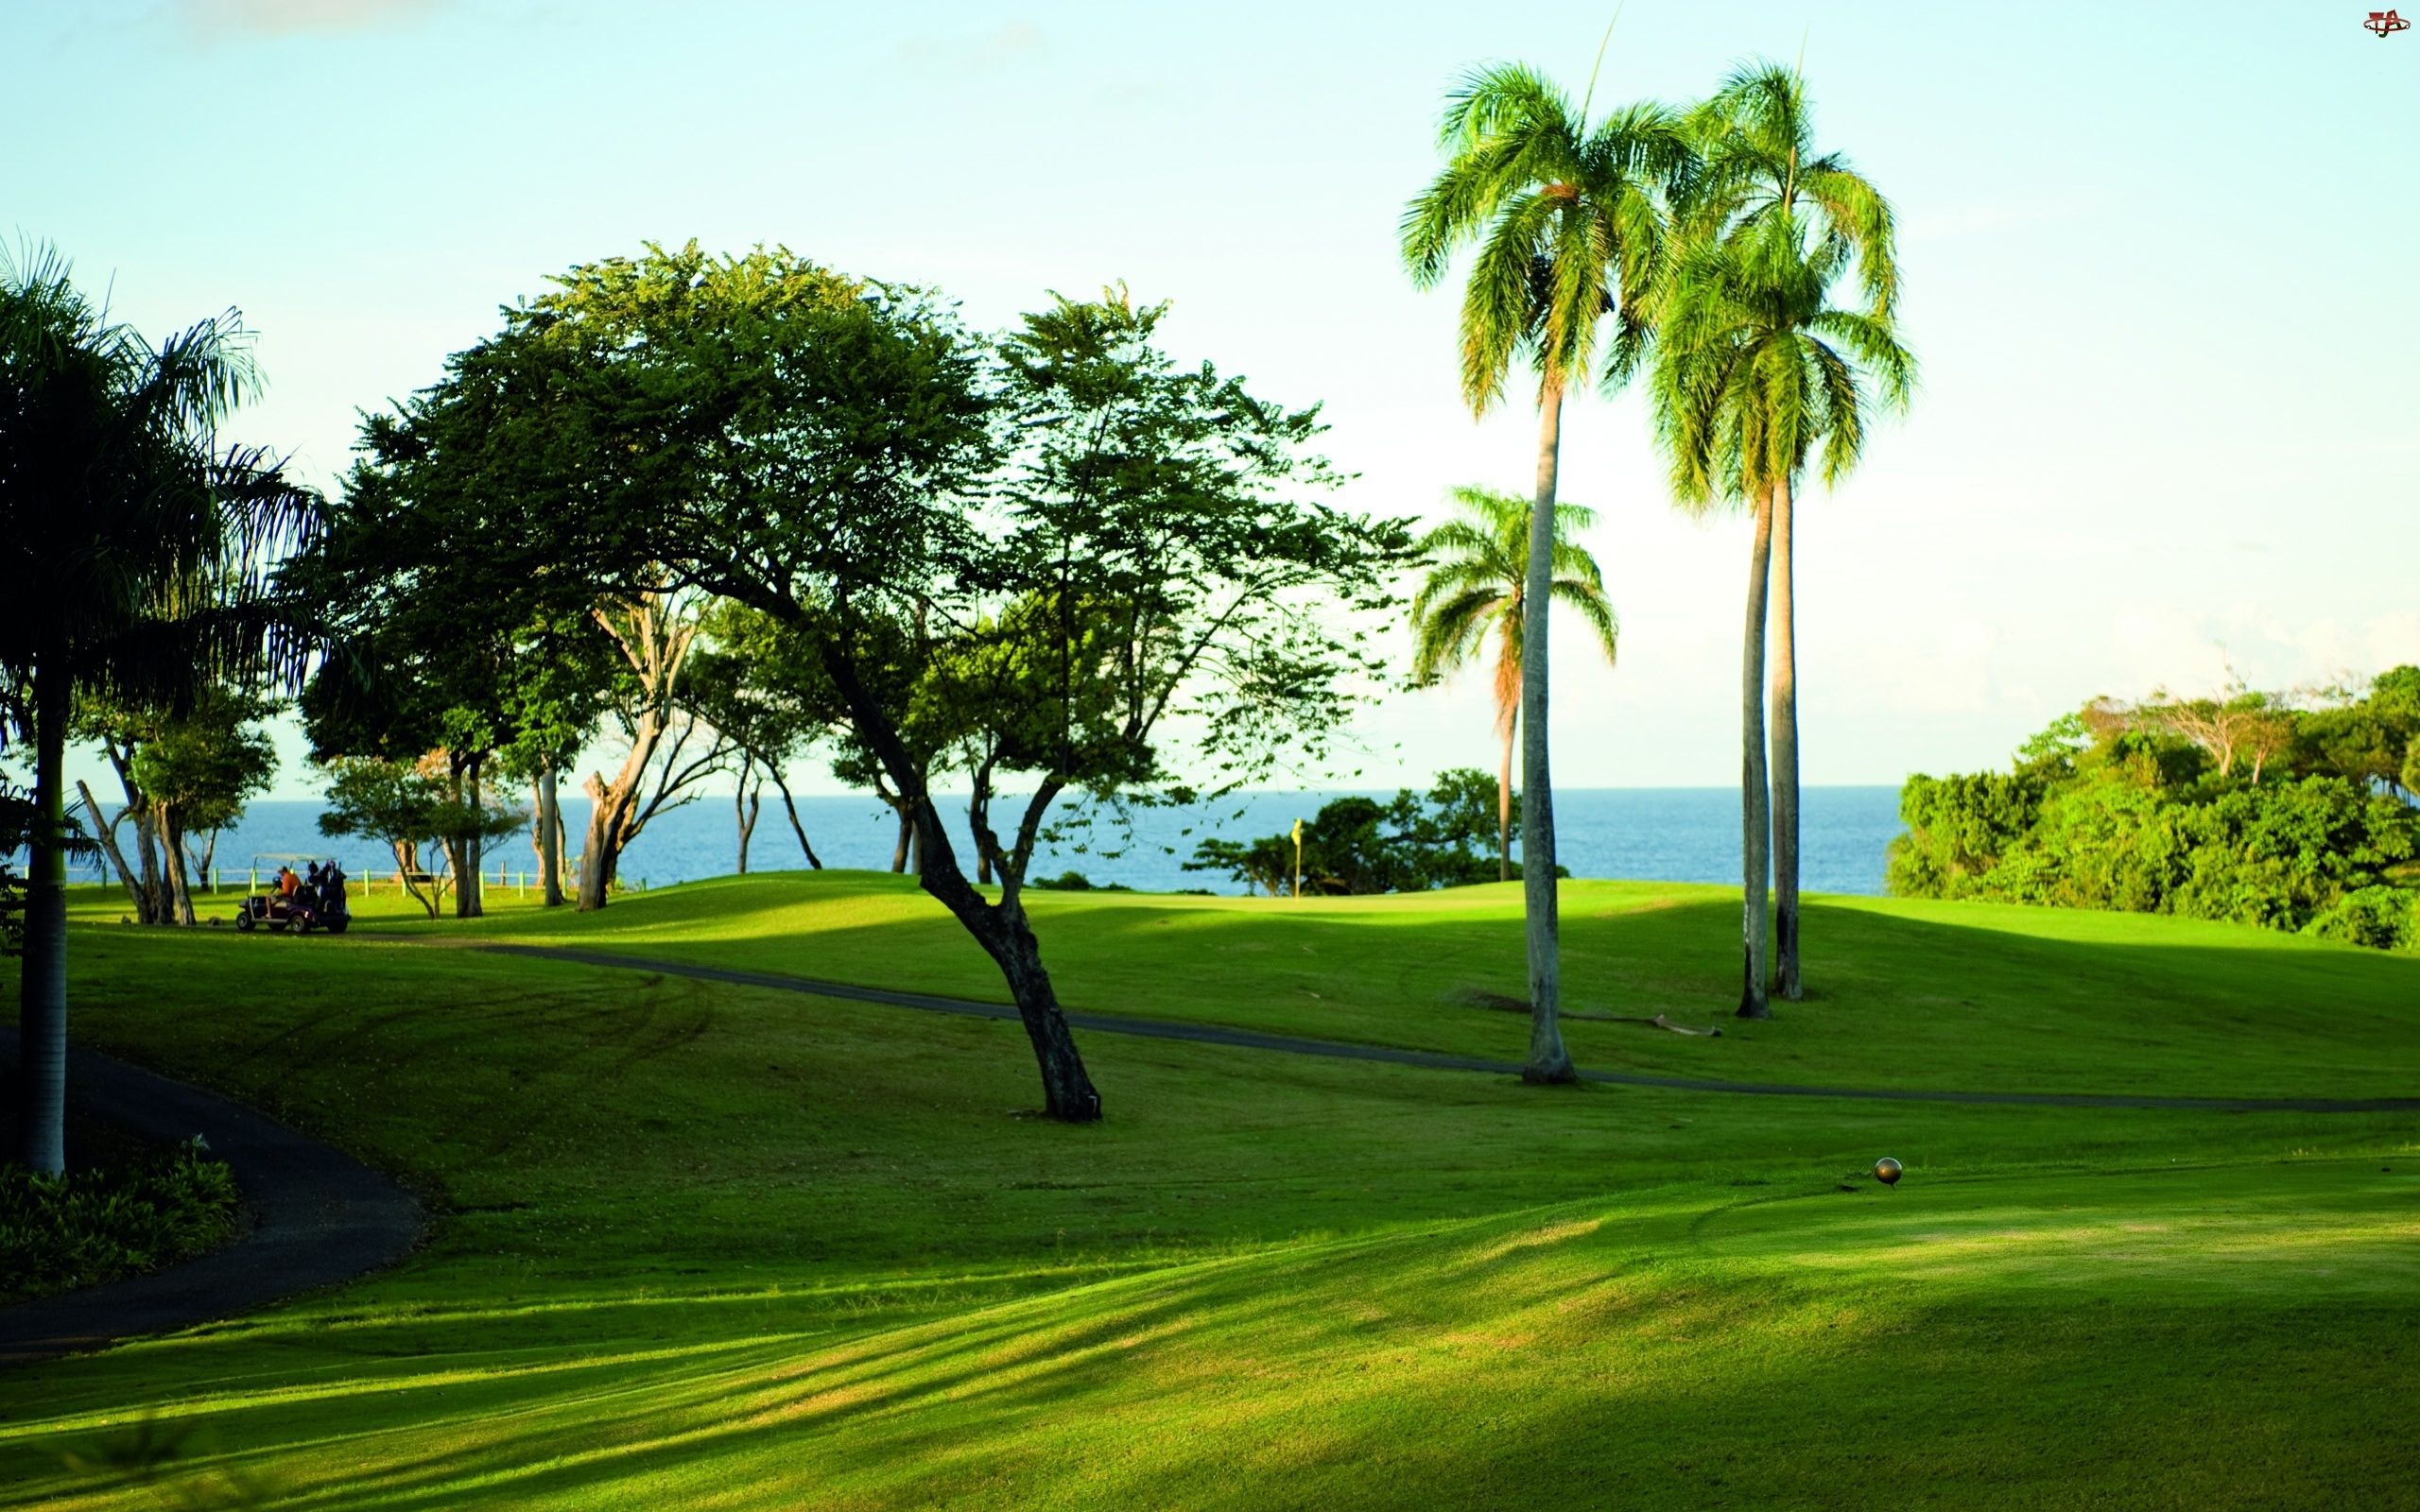 Pole, Morze, Golfowe, Drzewa